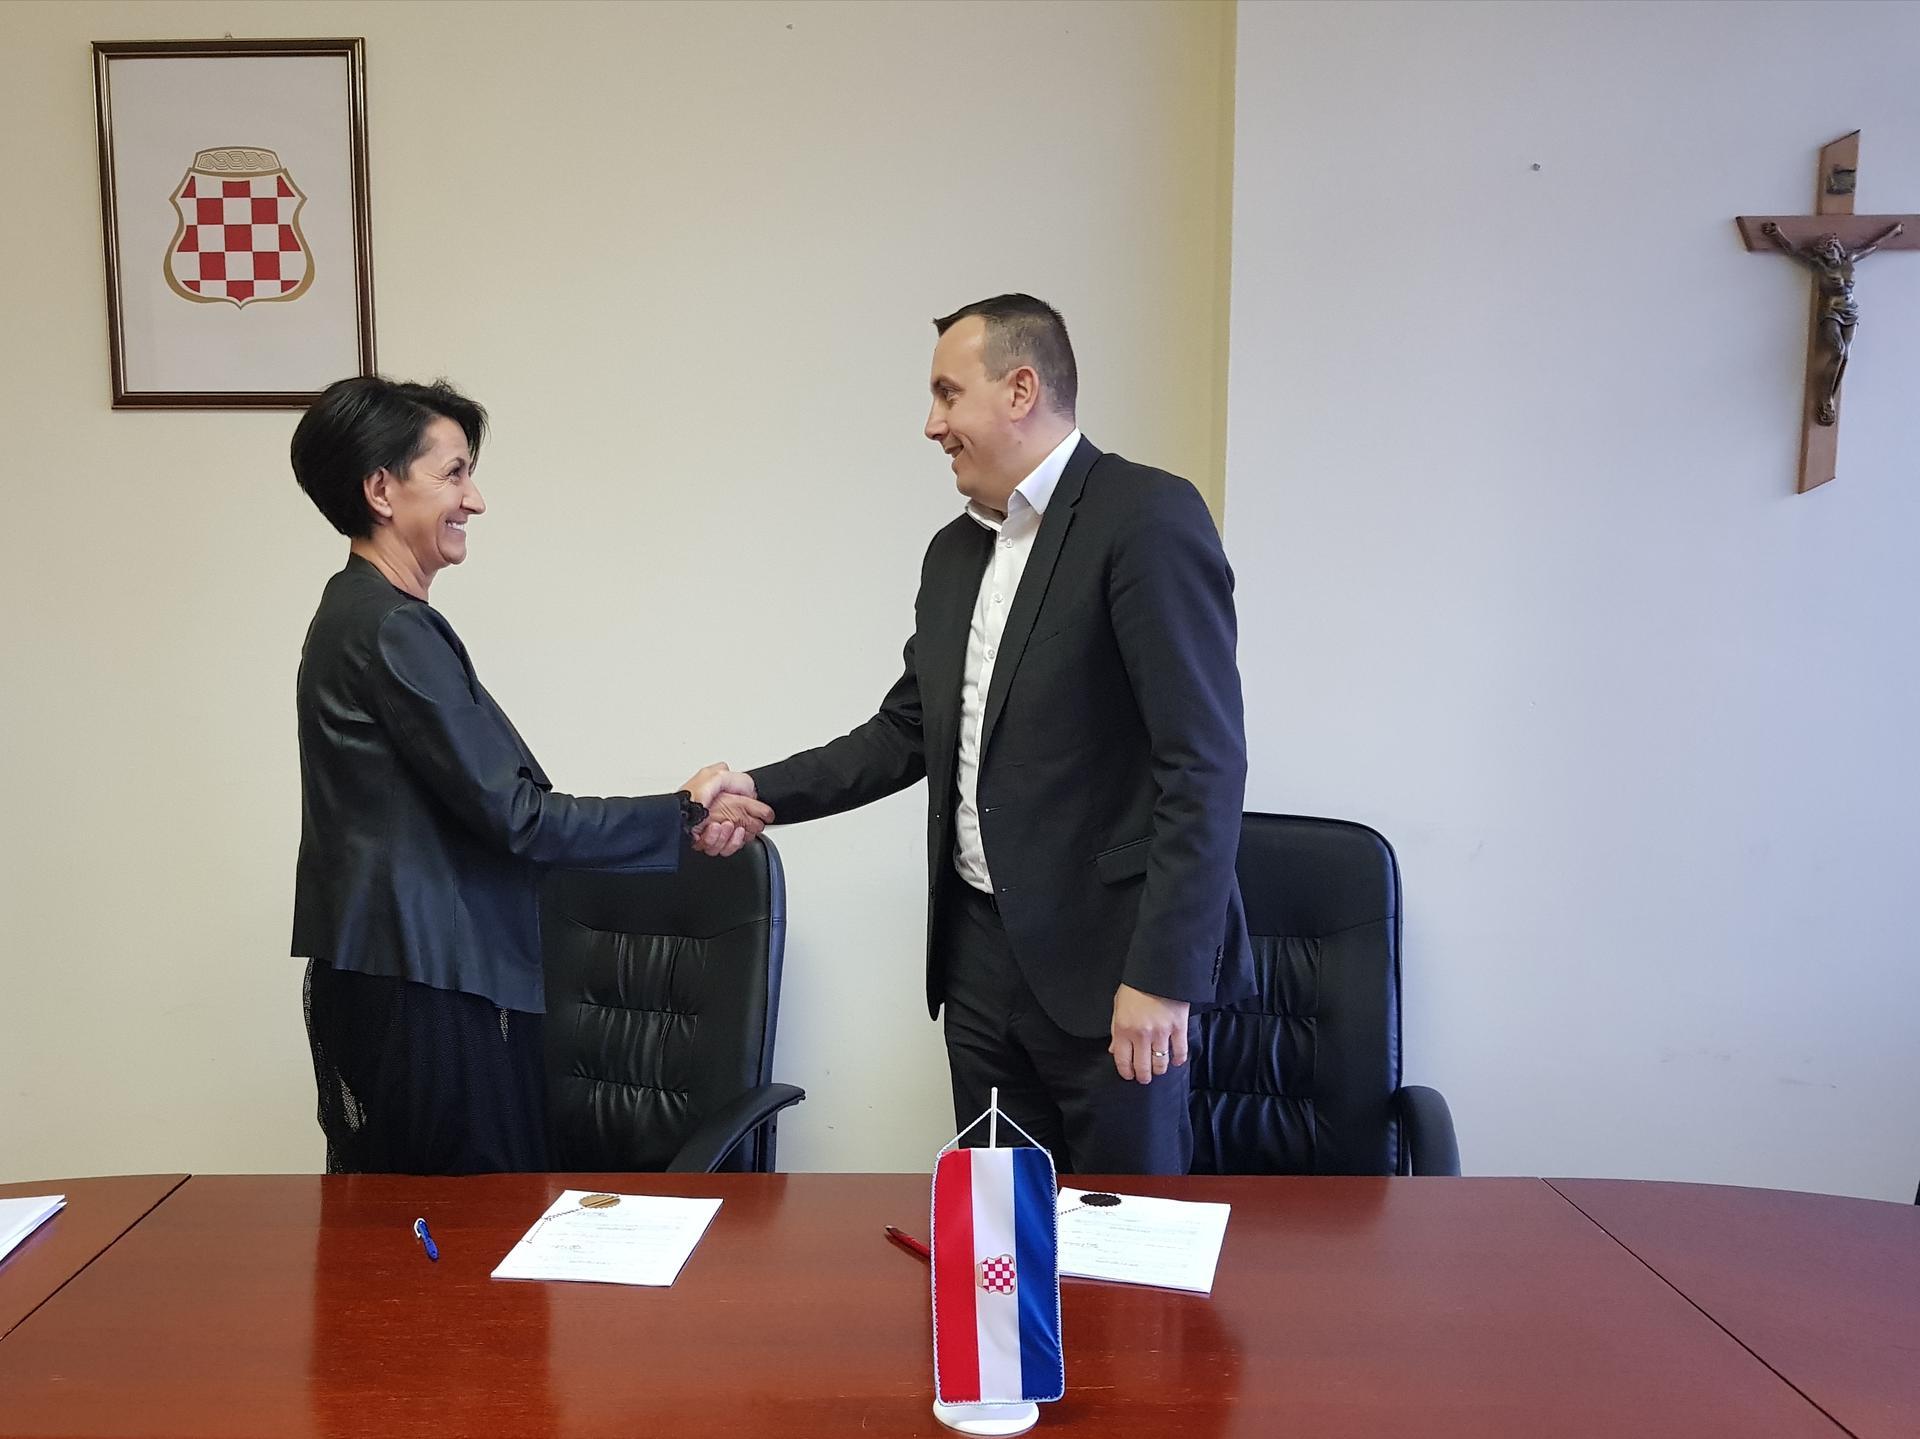 Ustrojen zajednički Zavod za školstvo ZHŽ-a i HBŽ-a, na čelo izabrana Jadranka Bošnjak